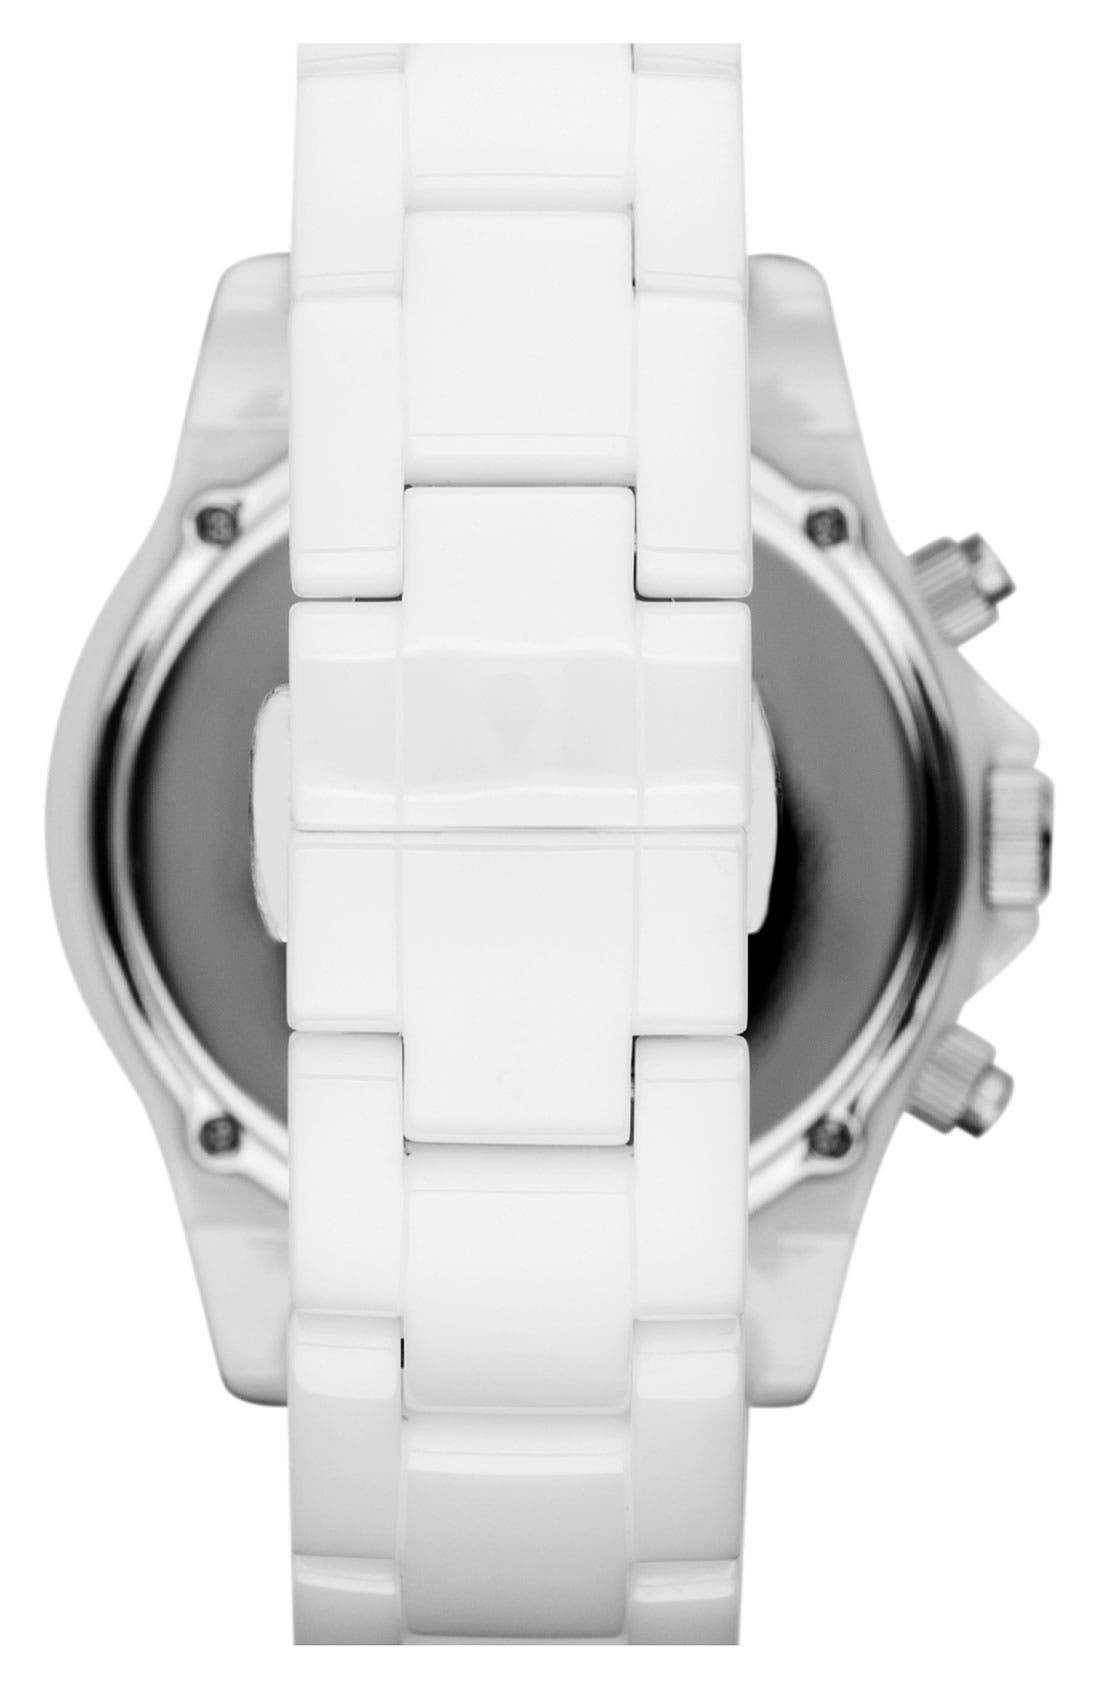 Alternate Image 3  - Michael Kors 'Madison' Crystal Bezel Ceramic Watch, 41mm